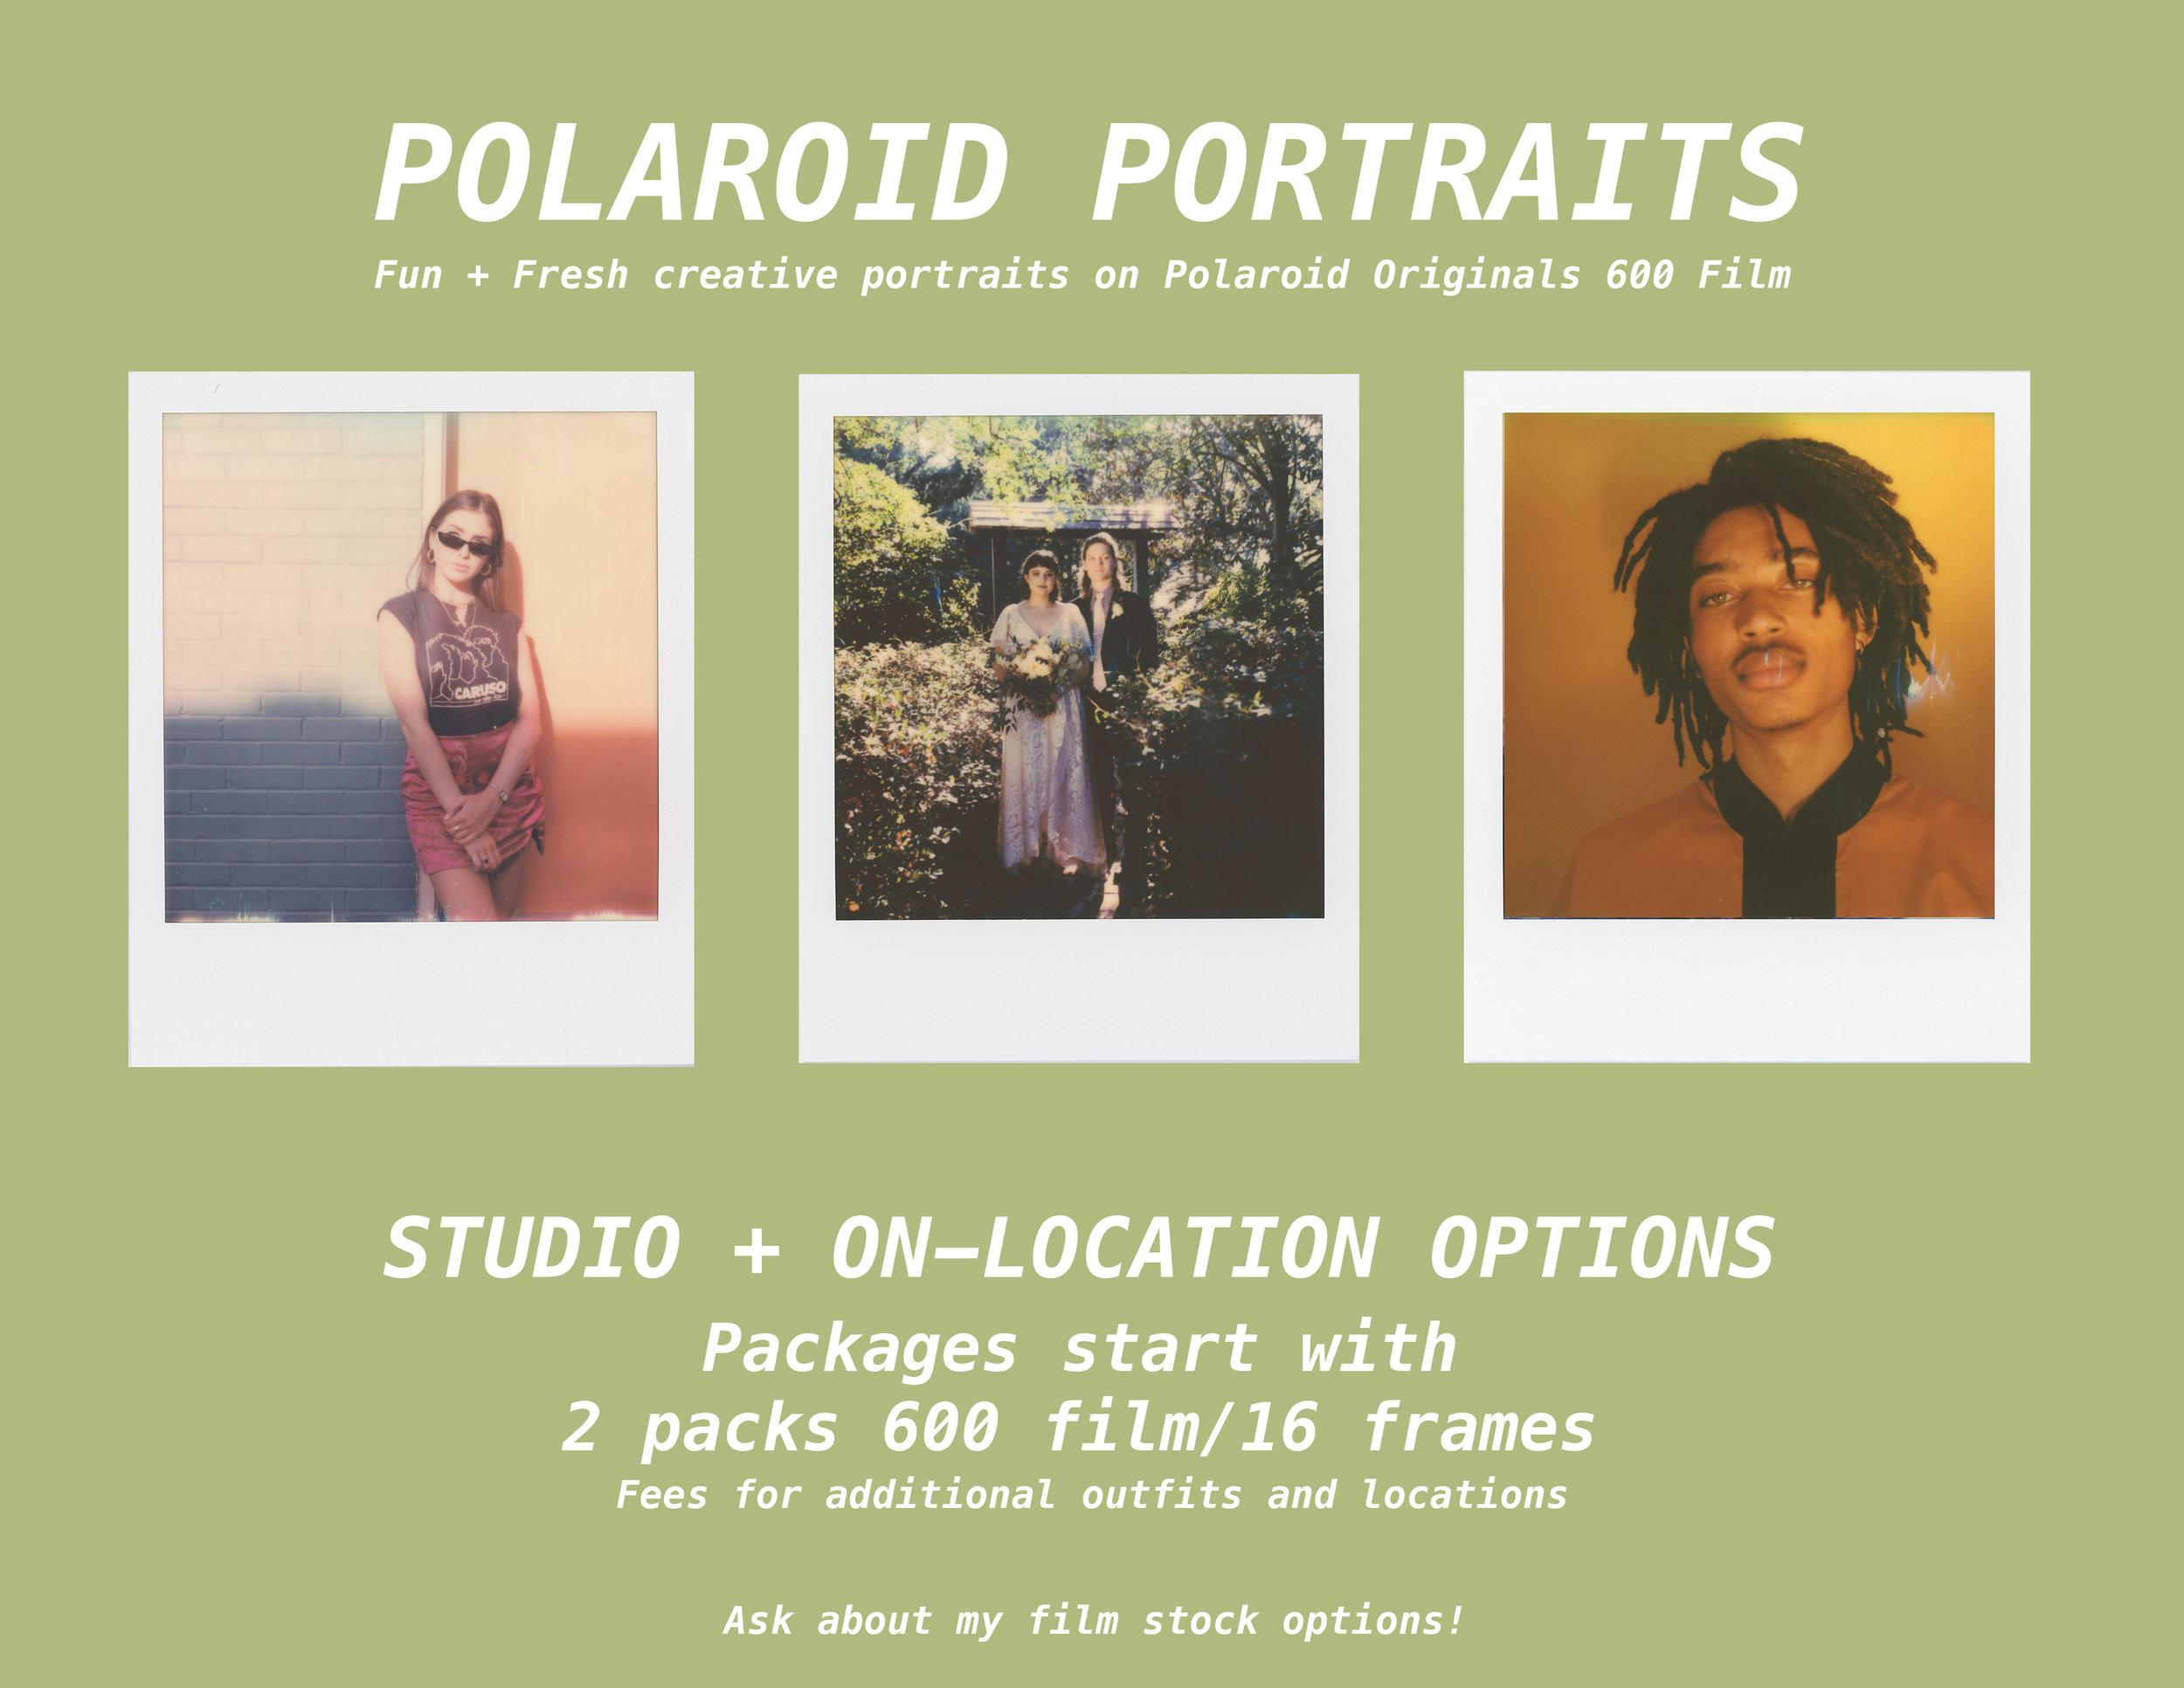 polaroidportraits-feesheet.jpg